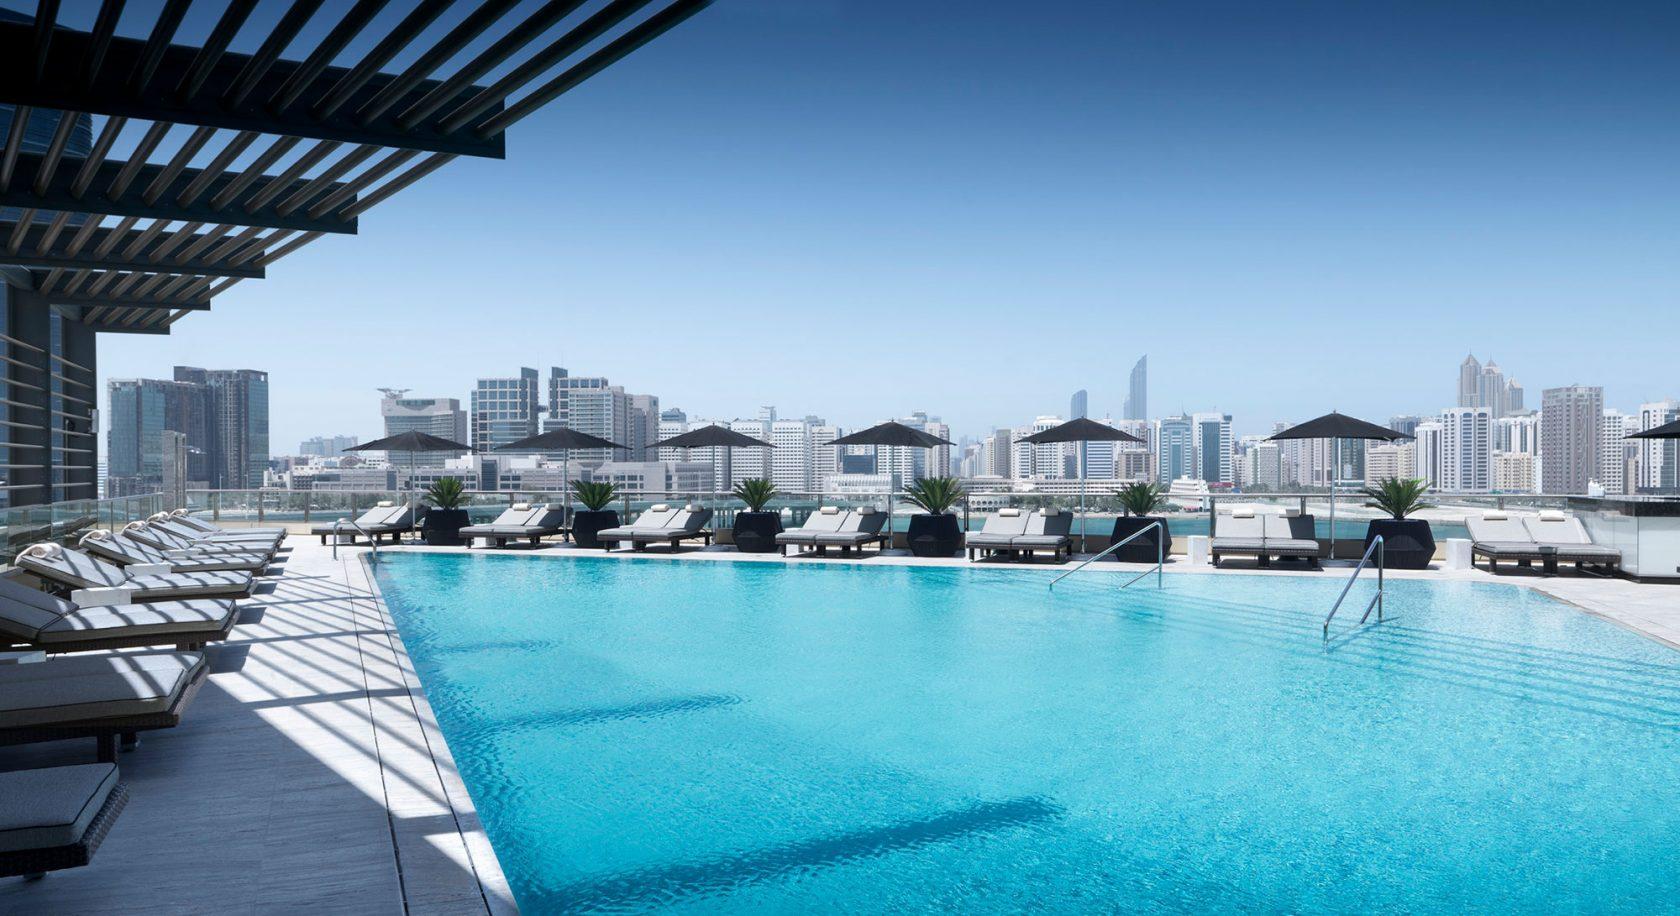 Four Seasons Al Maryah Island Pool